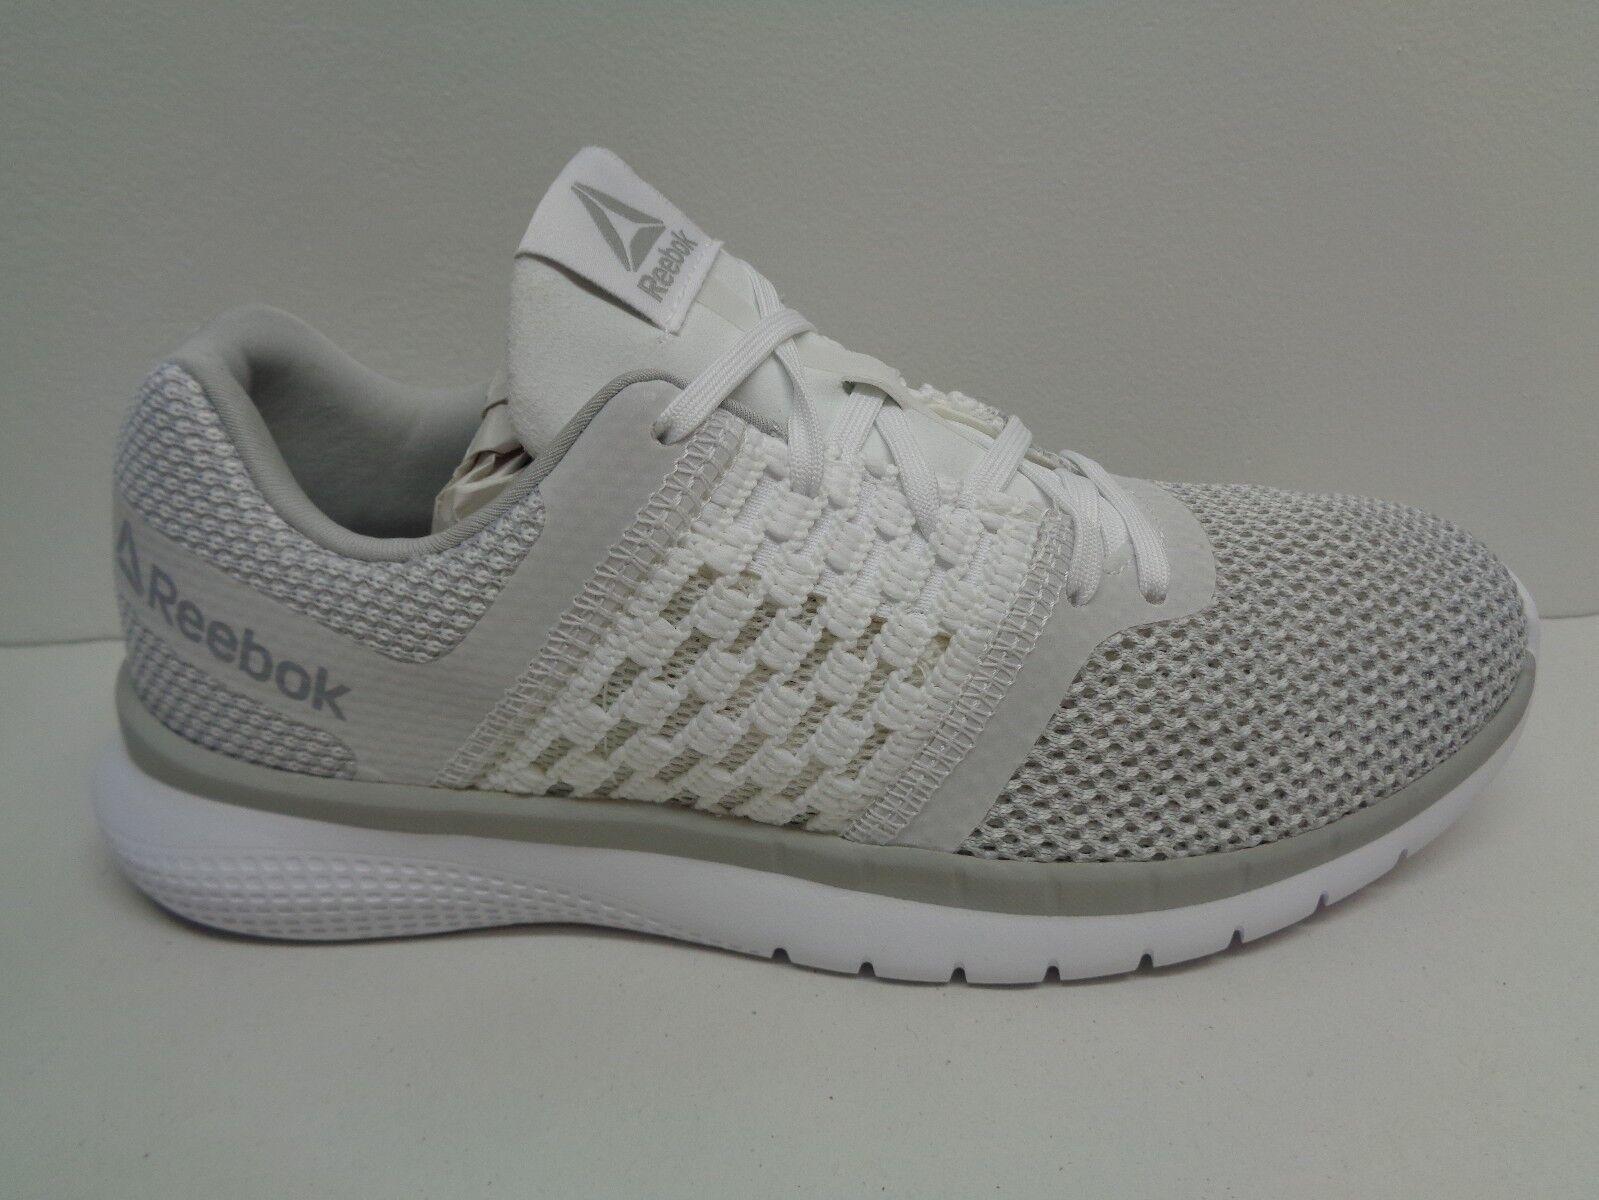 Reebok Size 8.5 M PT PRIME RUNNER White Steel Running Sneakers New Womens Shoes